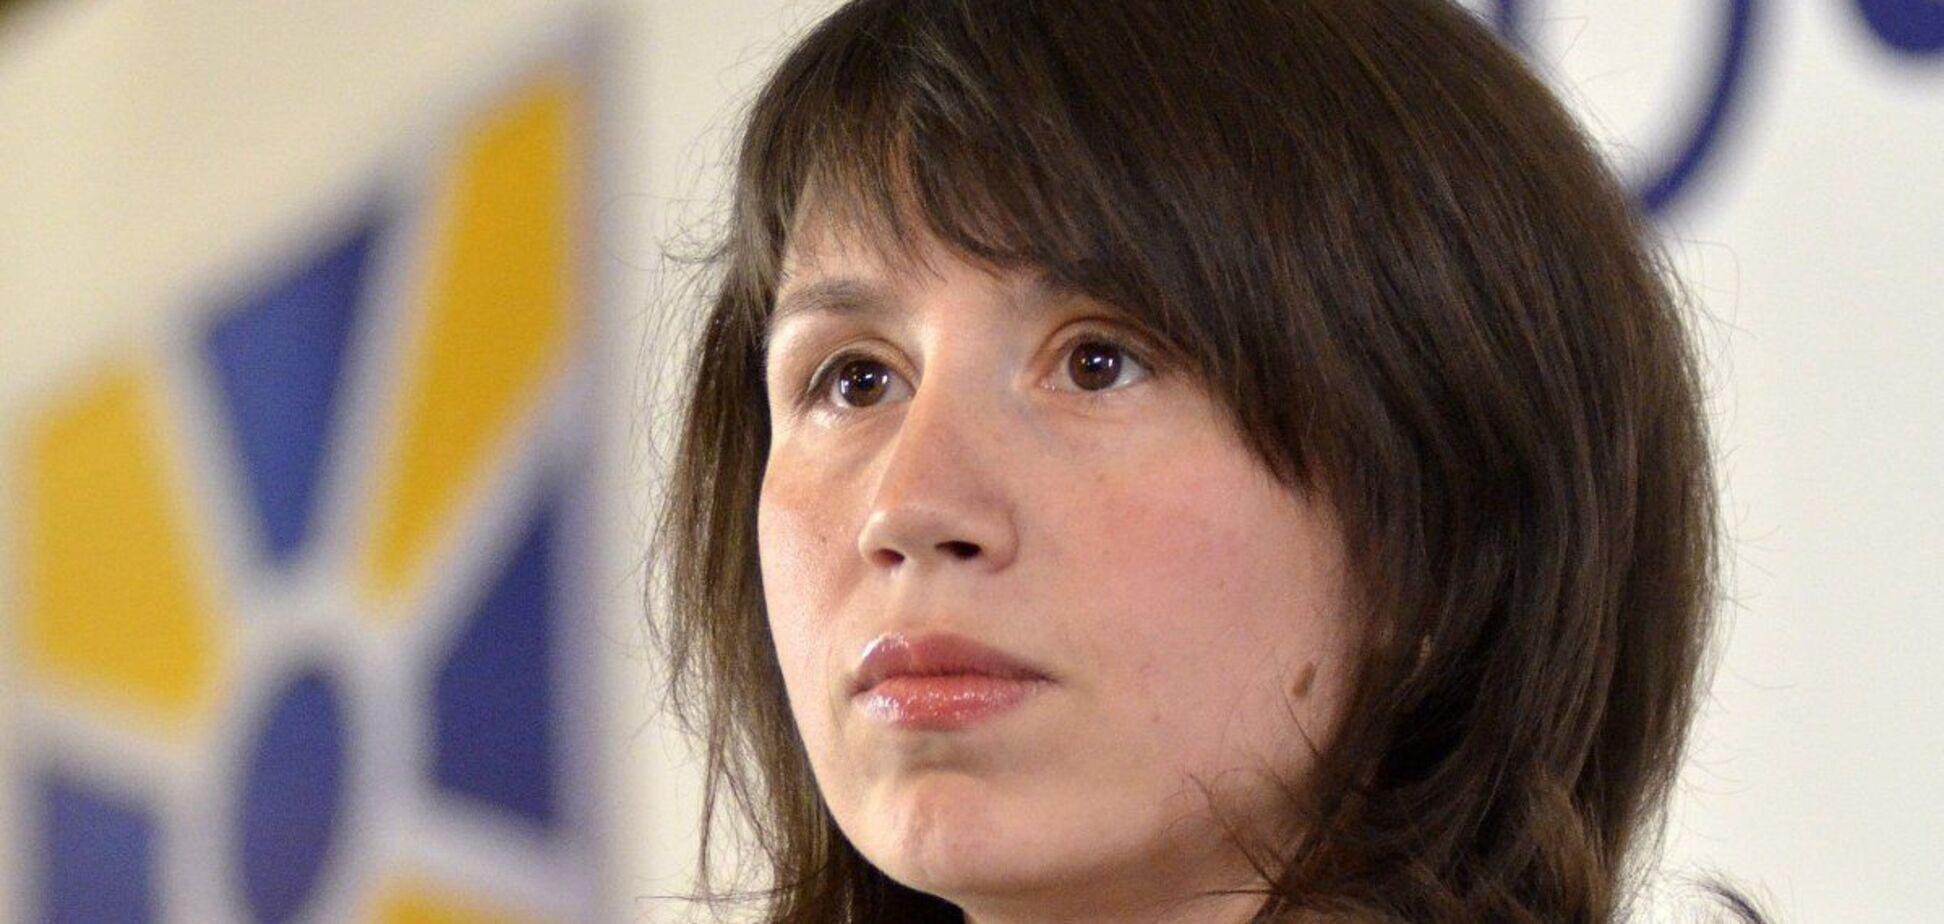 ГБР вручило Черновол подозрение в убийстве на Майдане. Документ